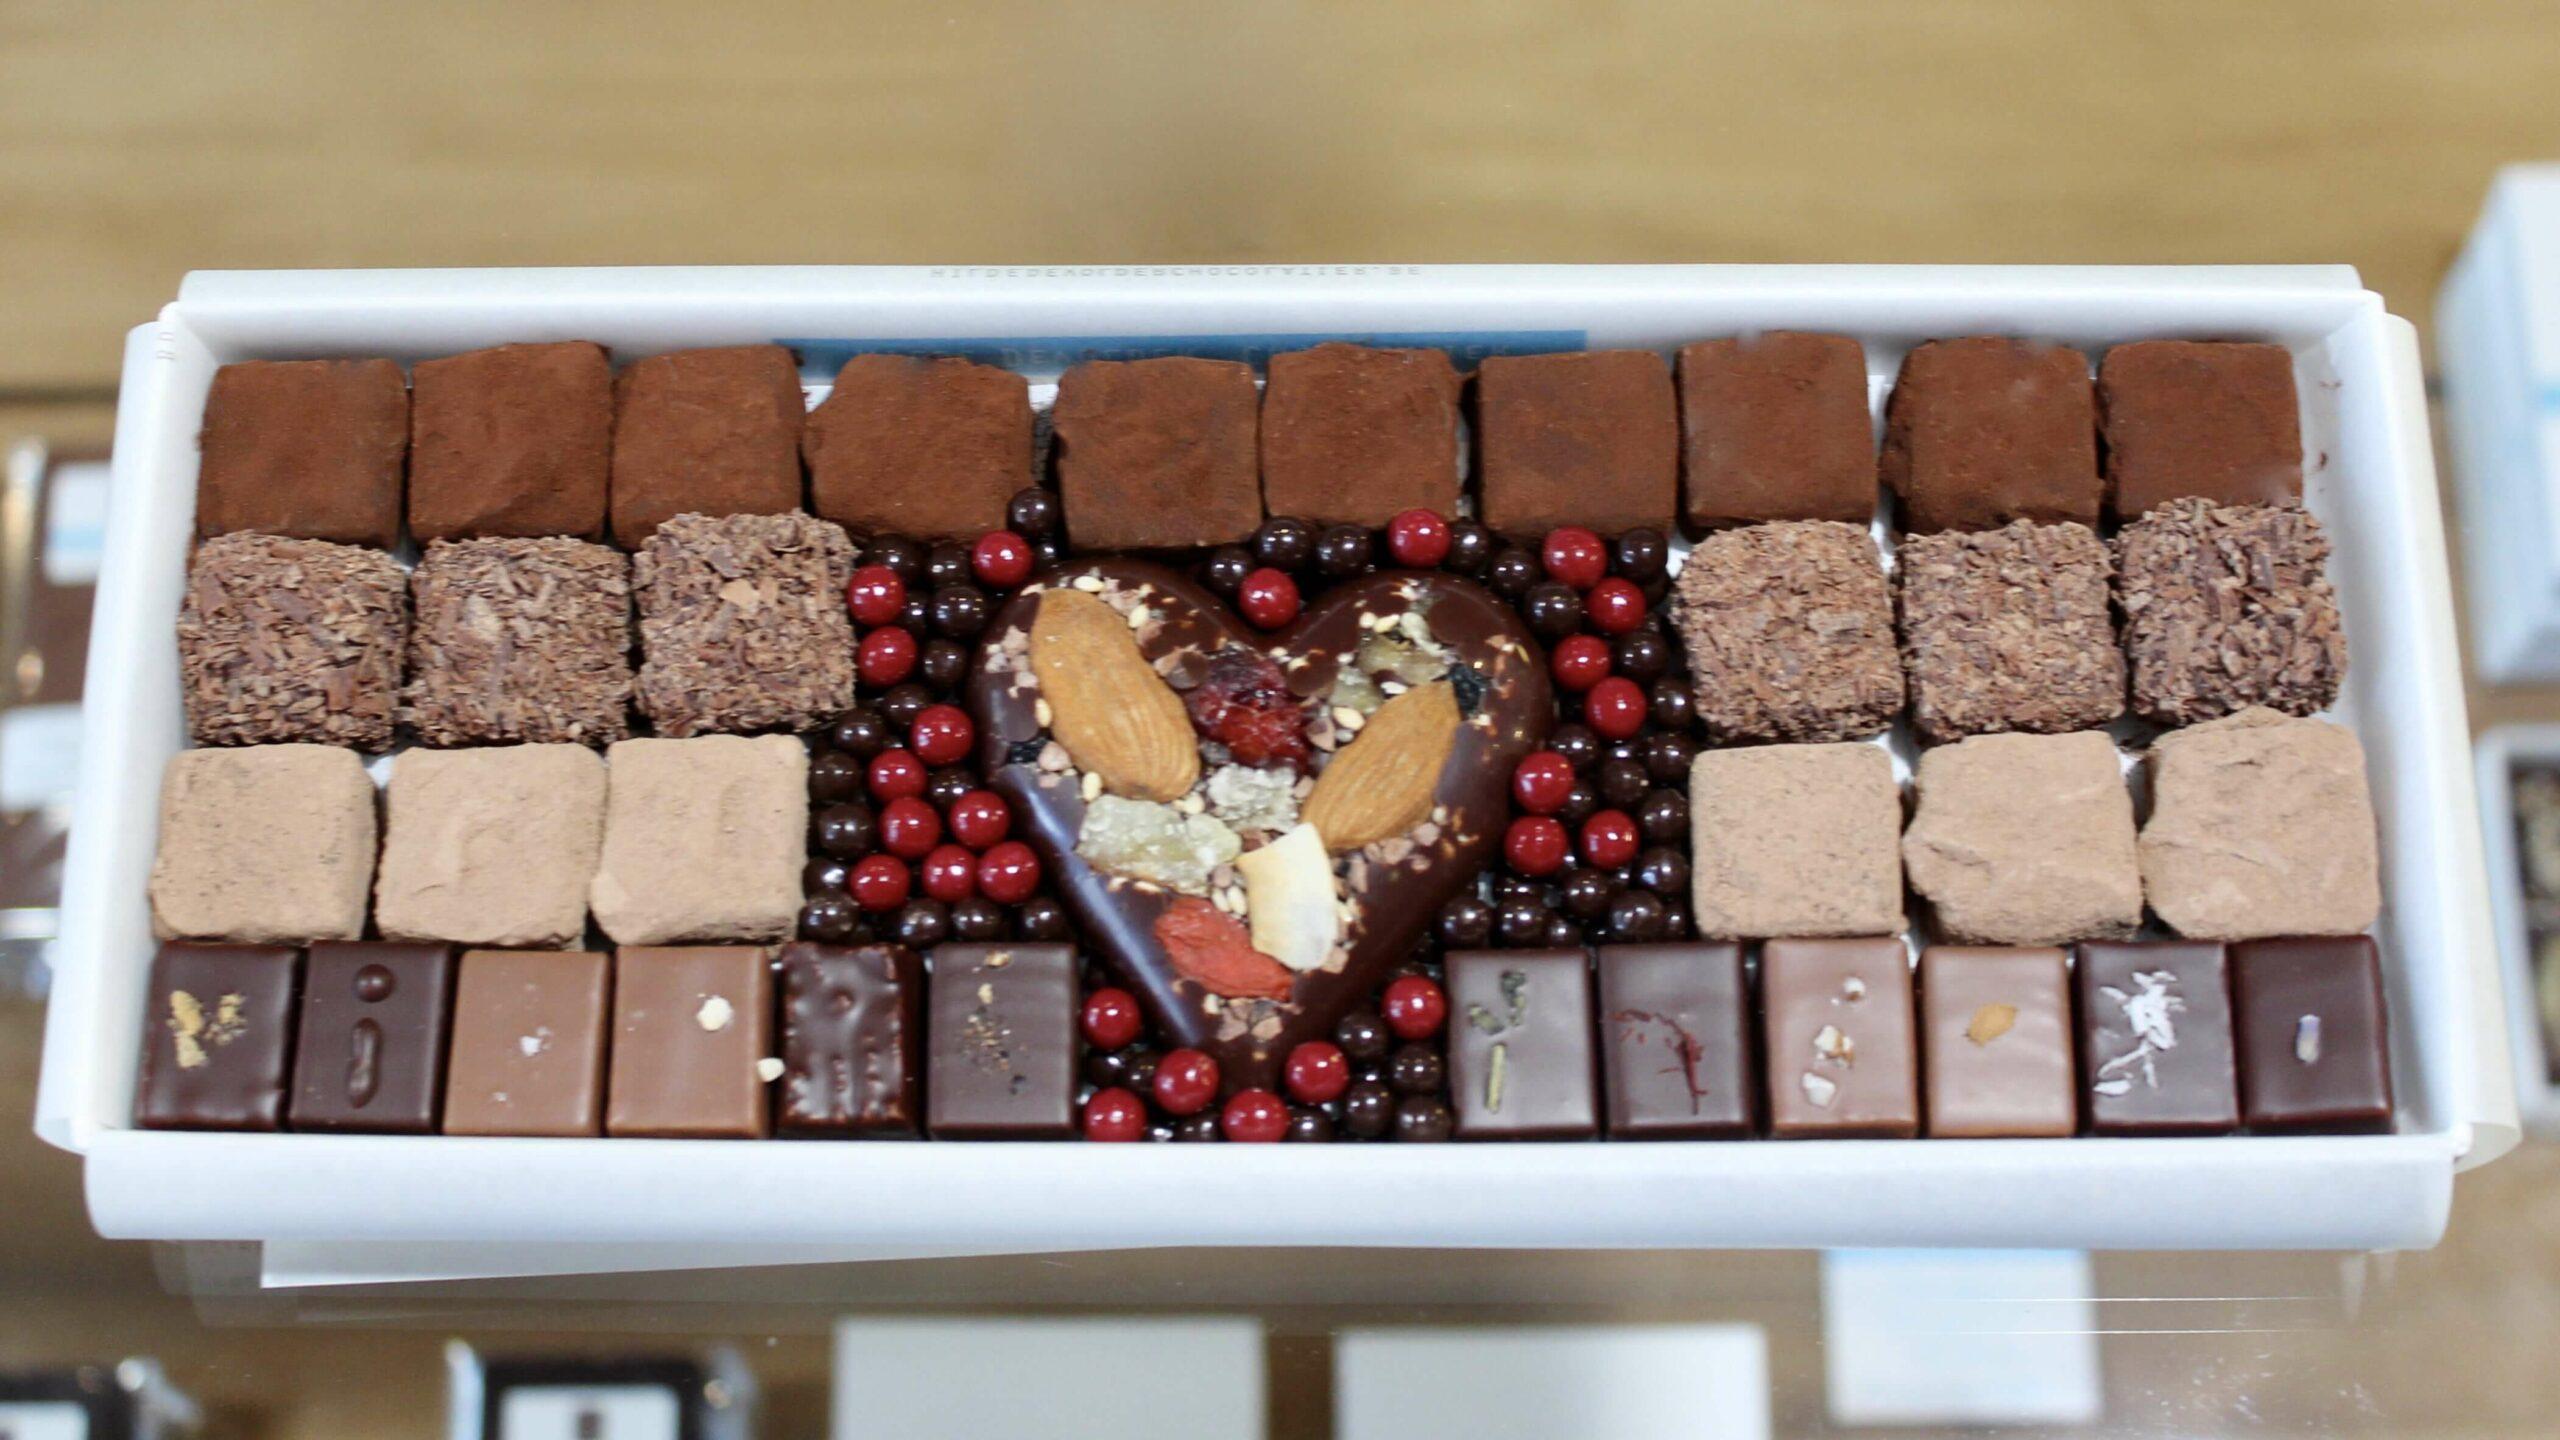 hilde devolder chocolatier fathers day 2020 big box